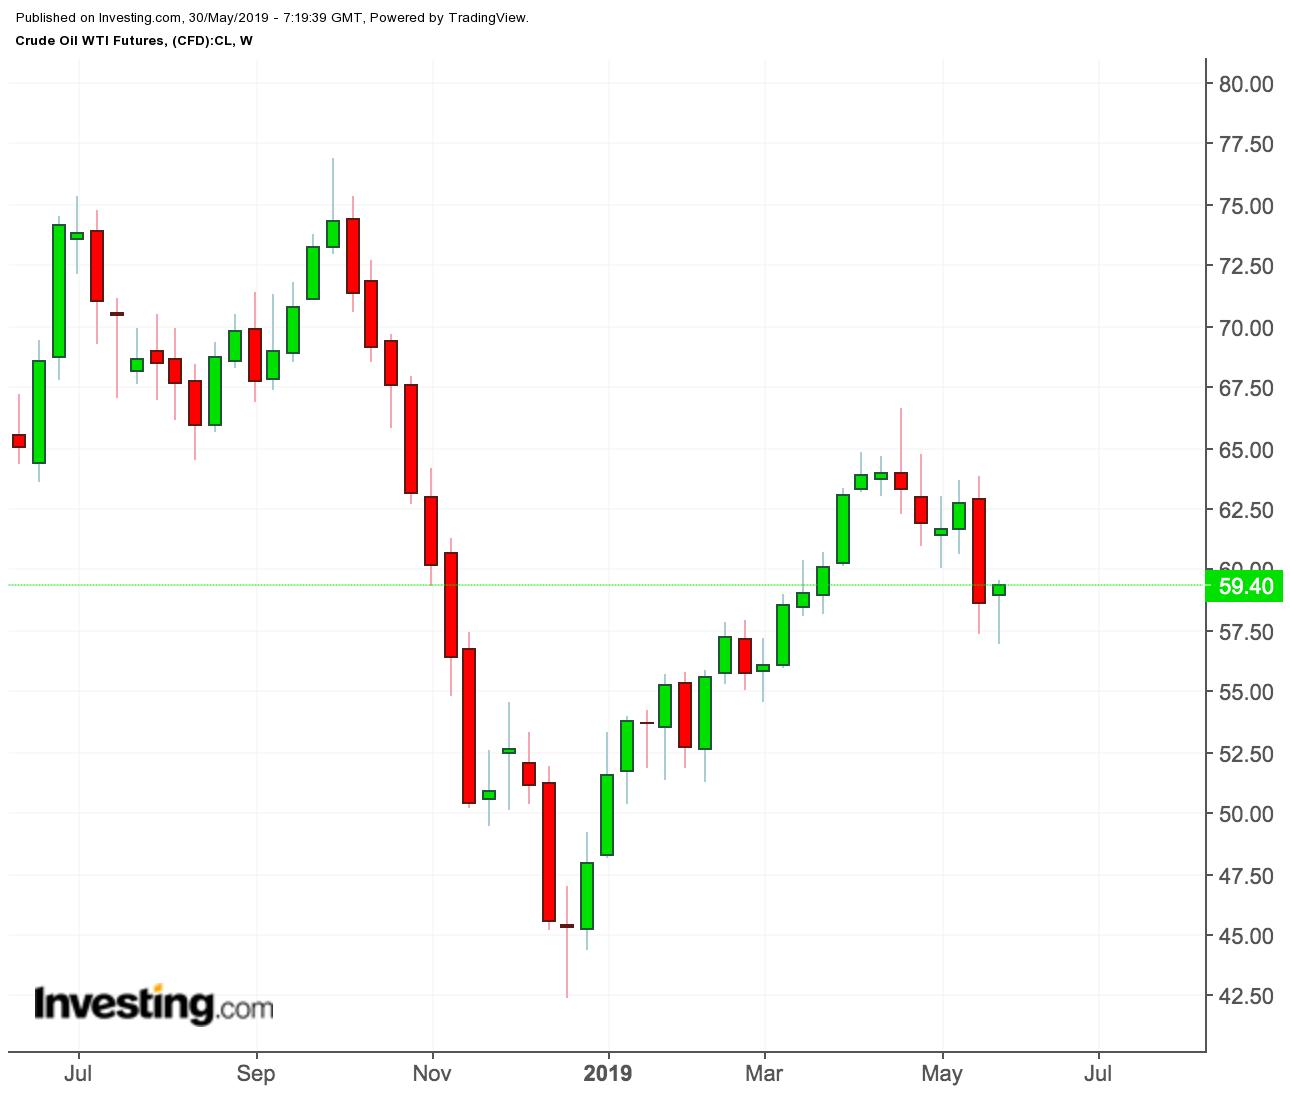 WTI weekly price chart